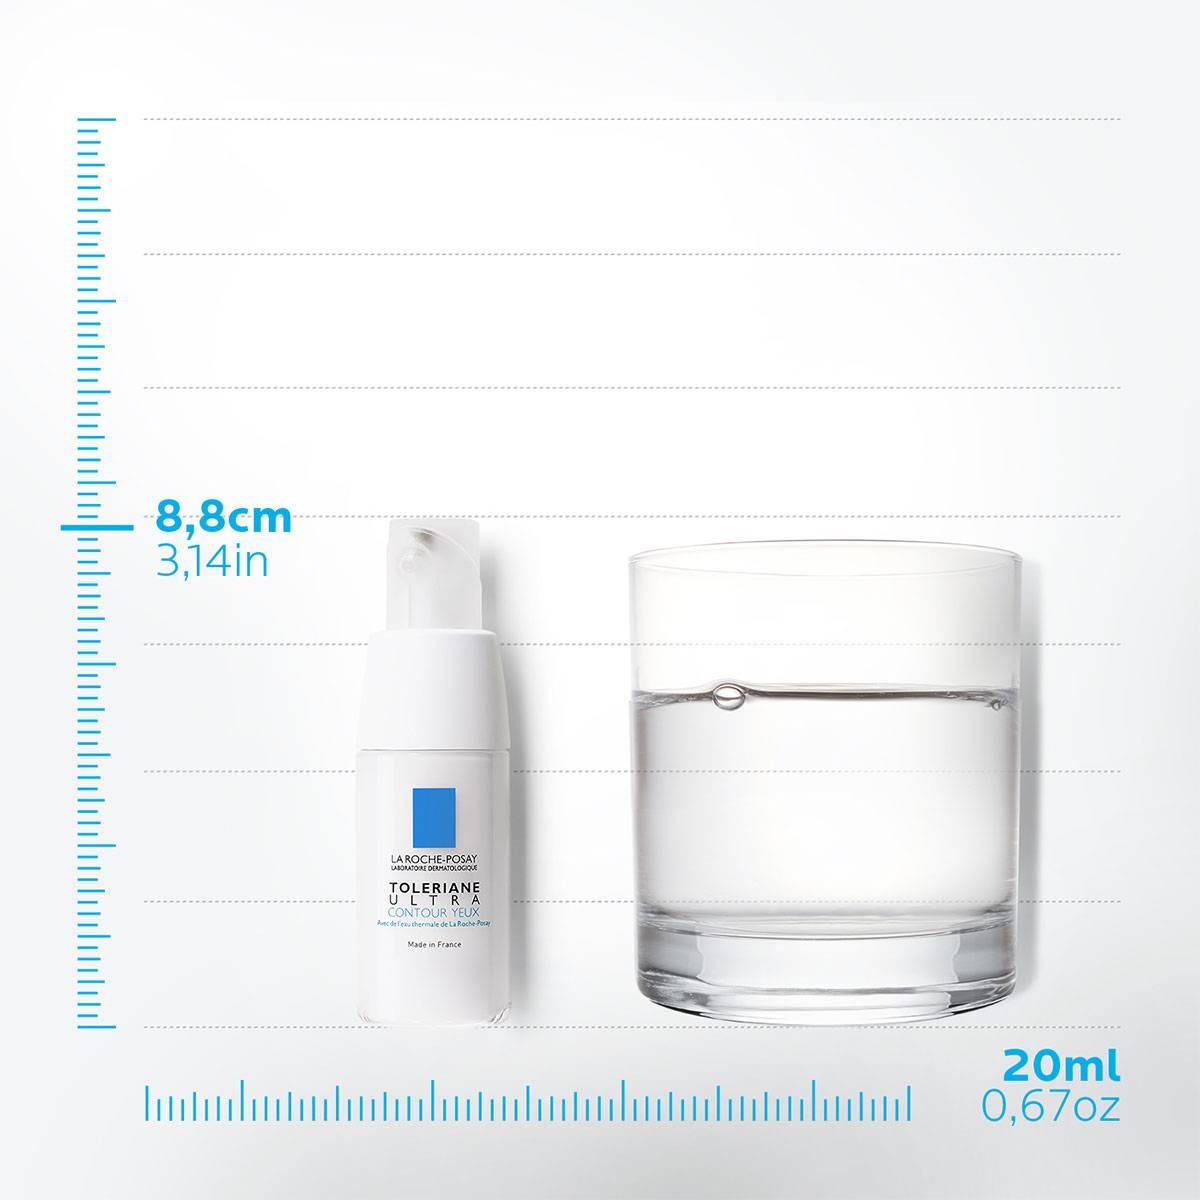 La Roche Posay ProduktSide Toleriane Ultra Øjenområde 20ml 3337872419